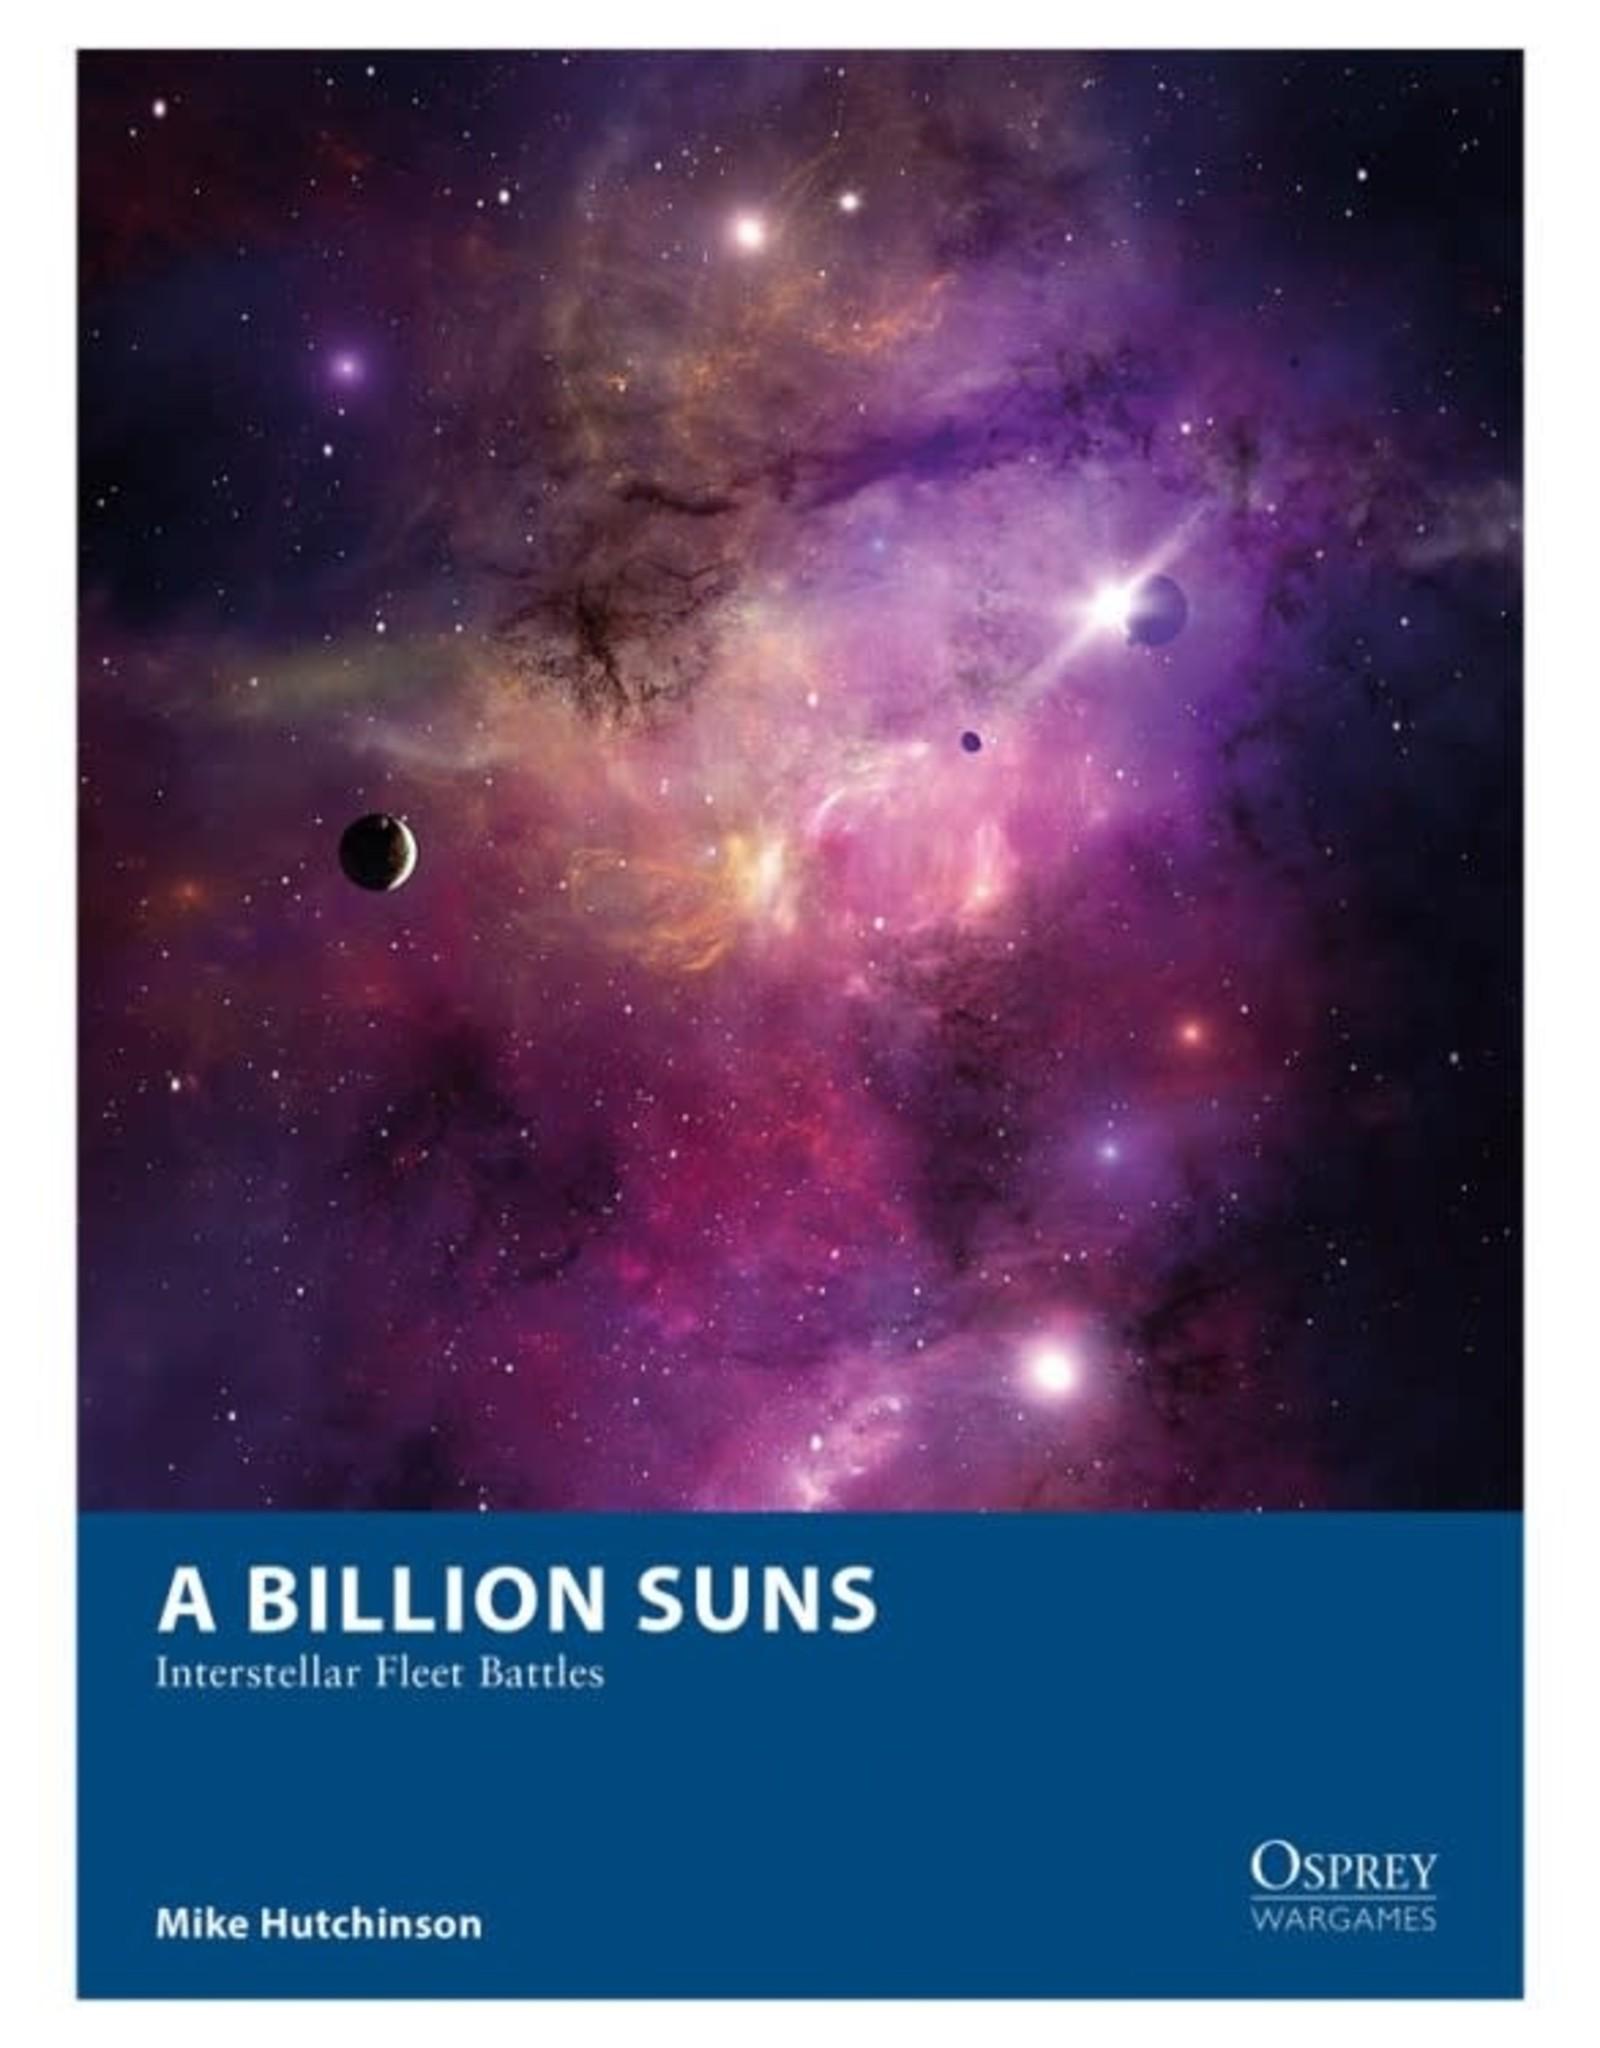 Osprey Games A Billion Suns: Interstellar Fleet Battles